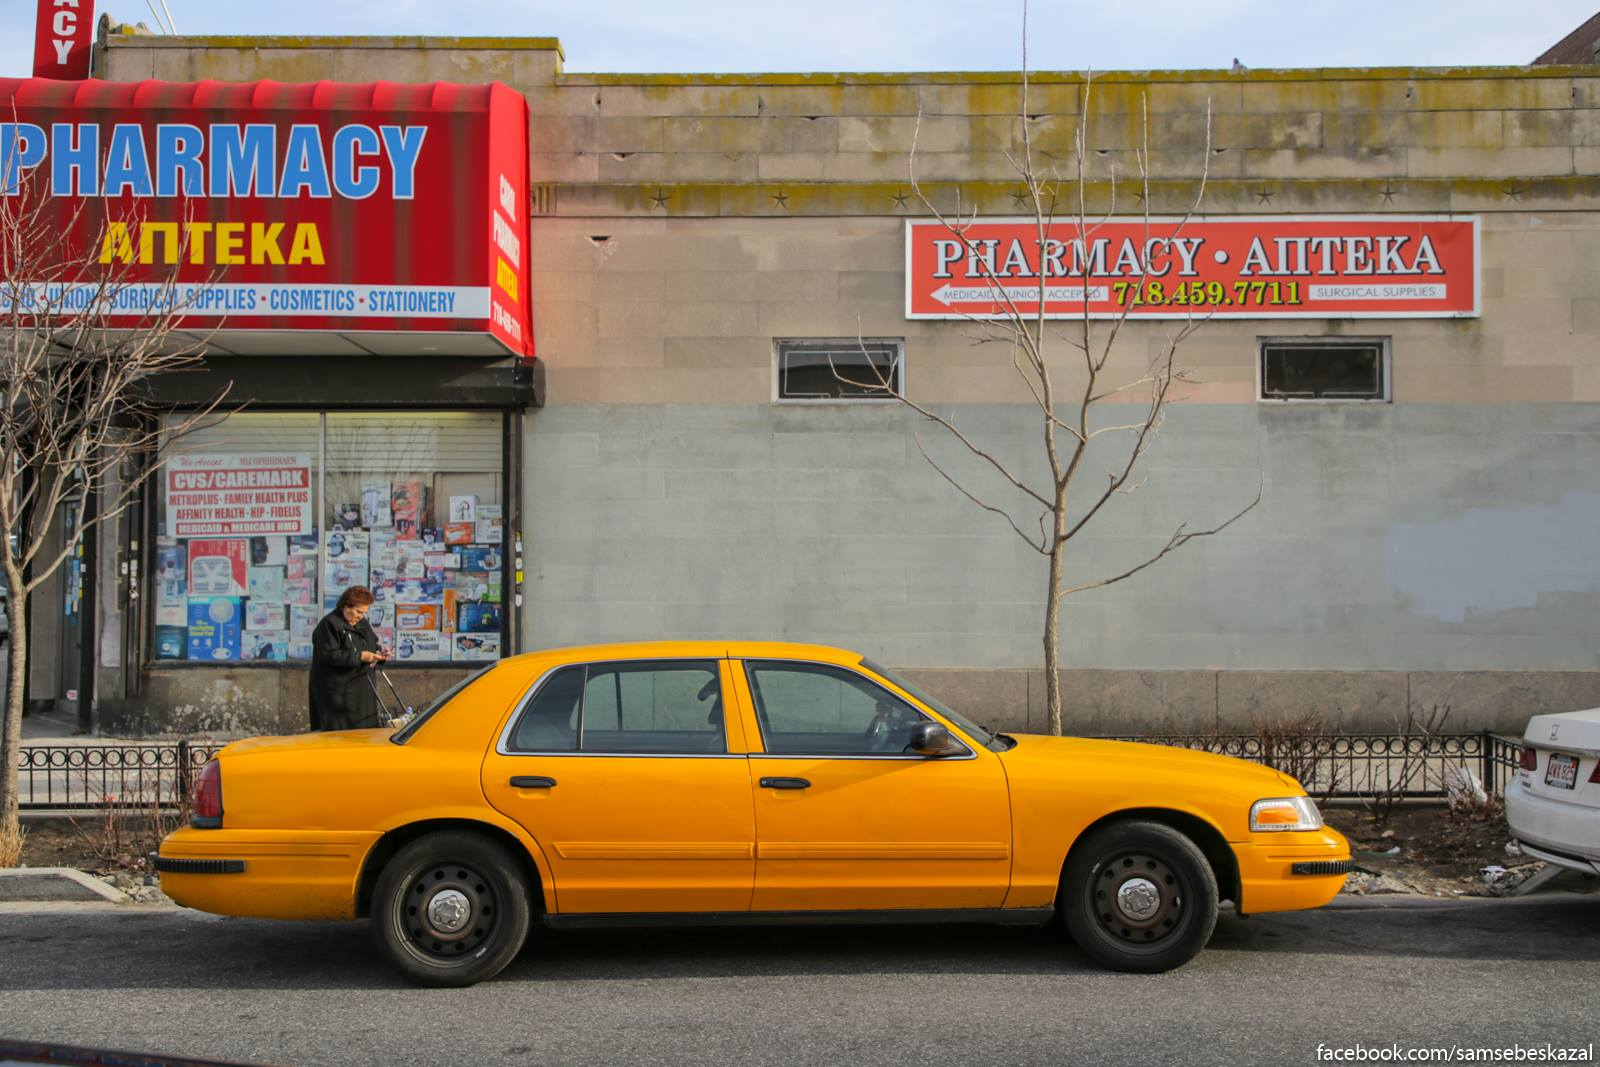 Apteka i staroe nʹu-jorkskoe taksi. Do cego zivucie masiny. Ona v taksi polmilliona milʹ prosla i ese ezditʹ budet.